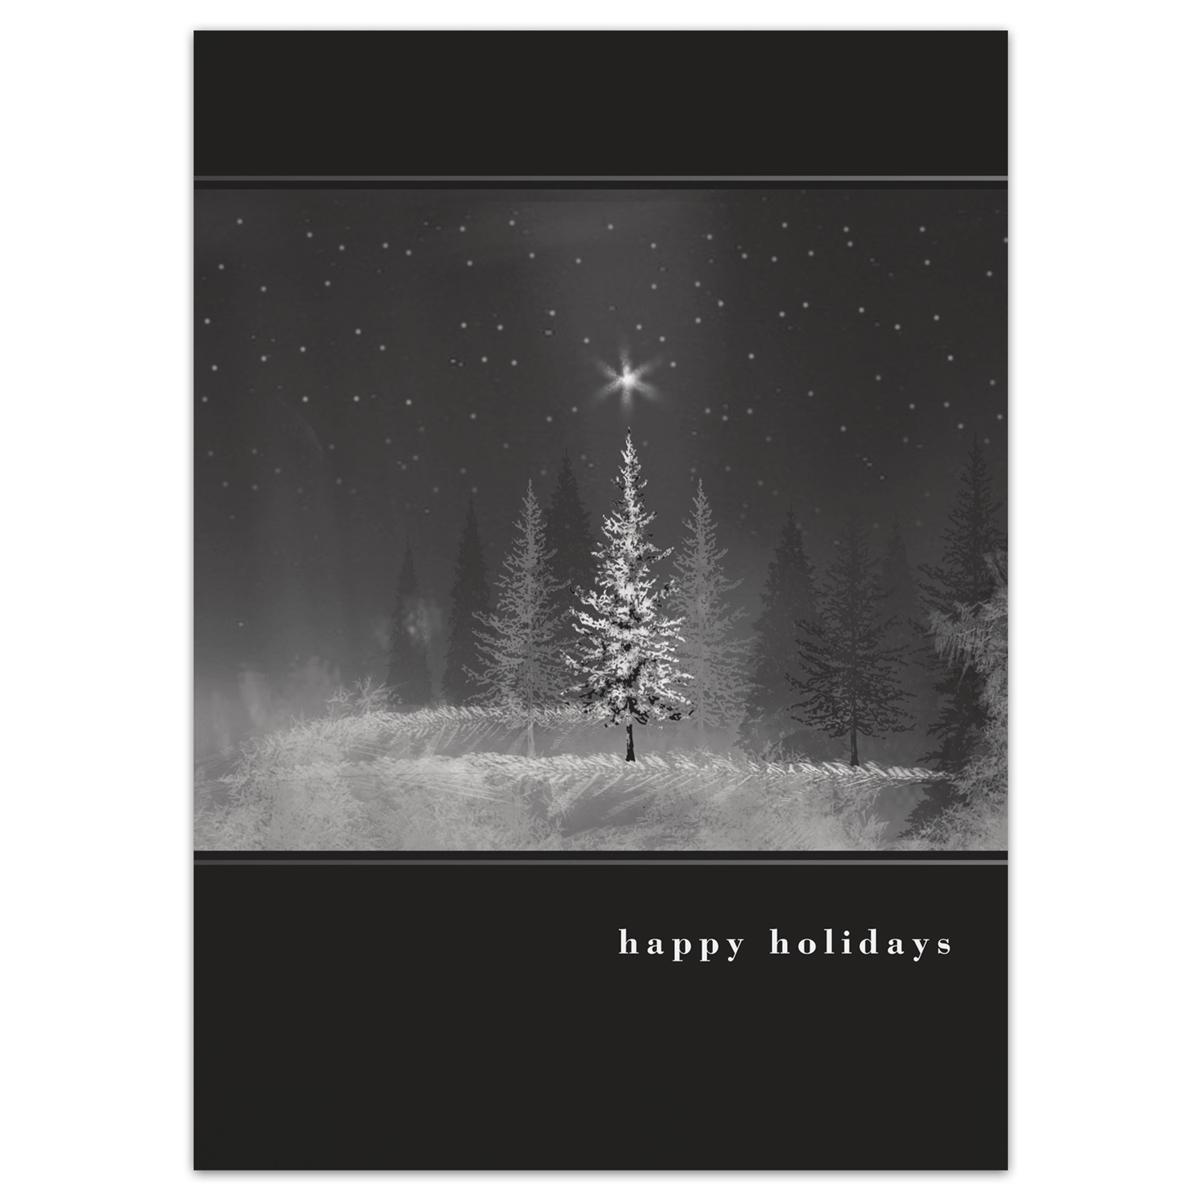 Starry Treeline Holiday Cards